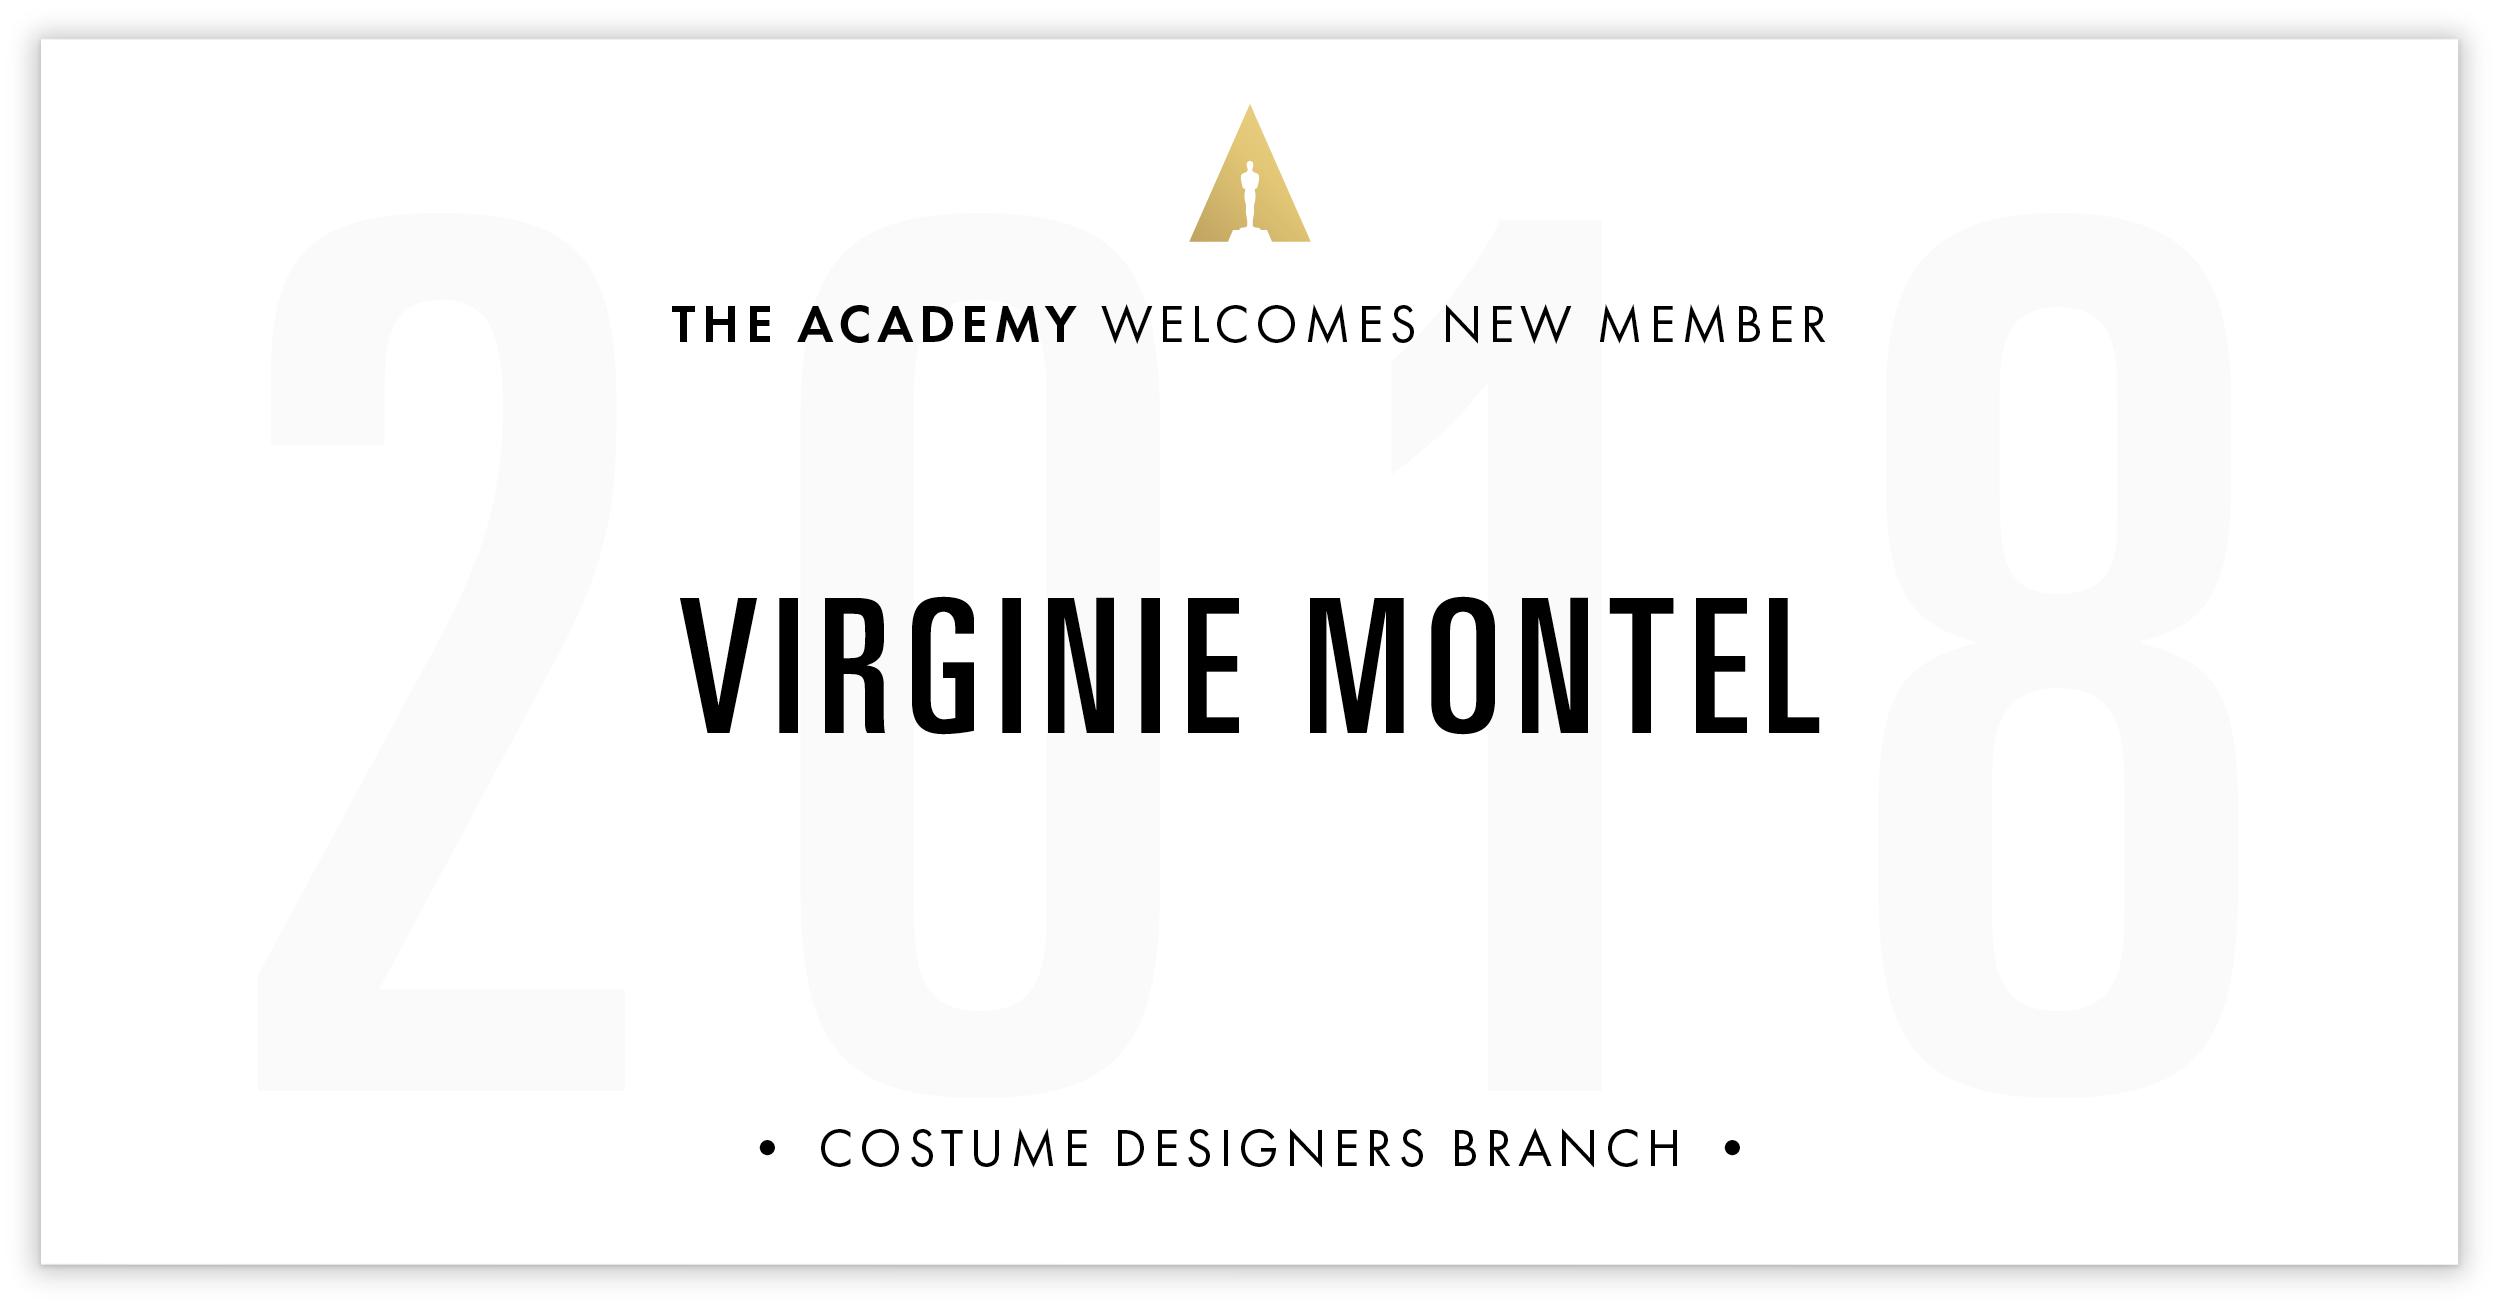 Virginie Montel is invited!